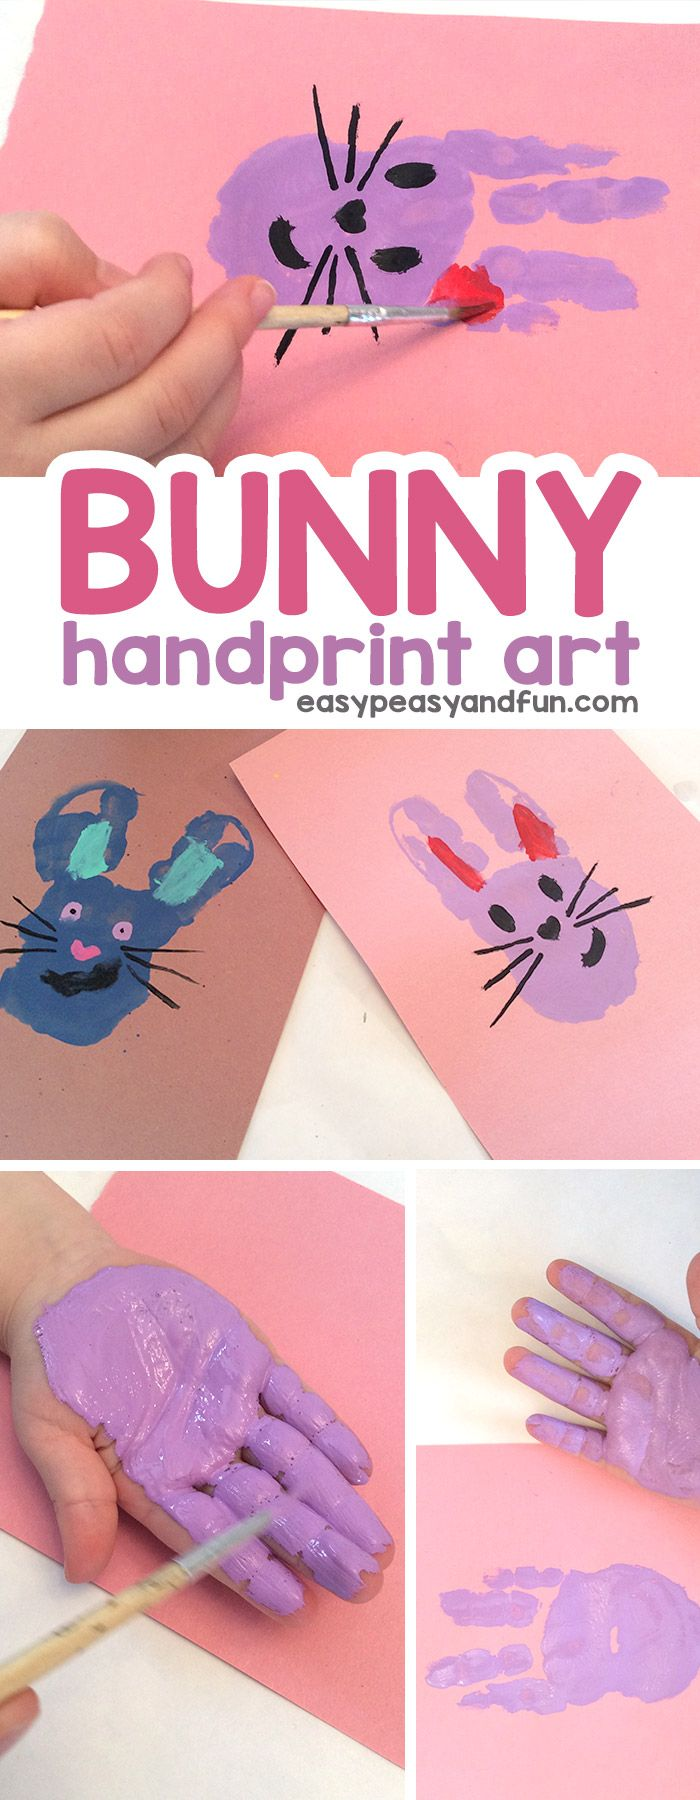 Bunny Handprint Art